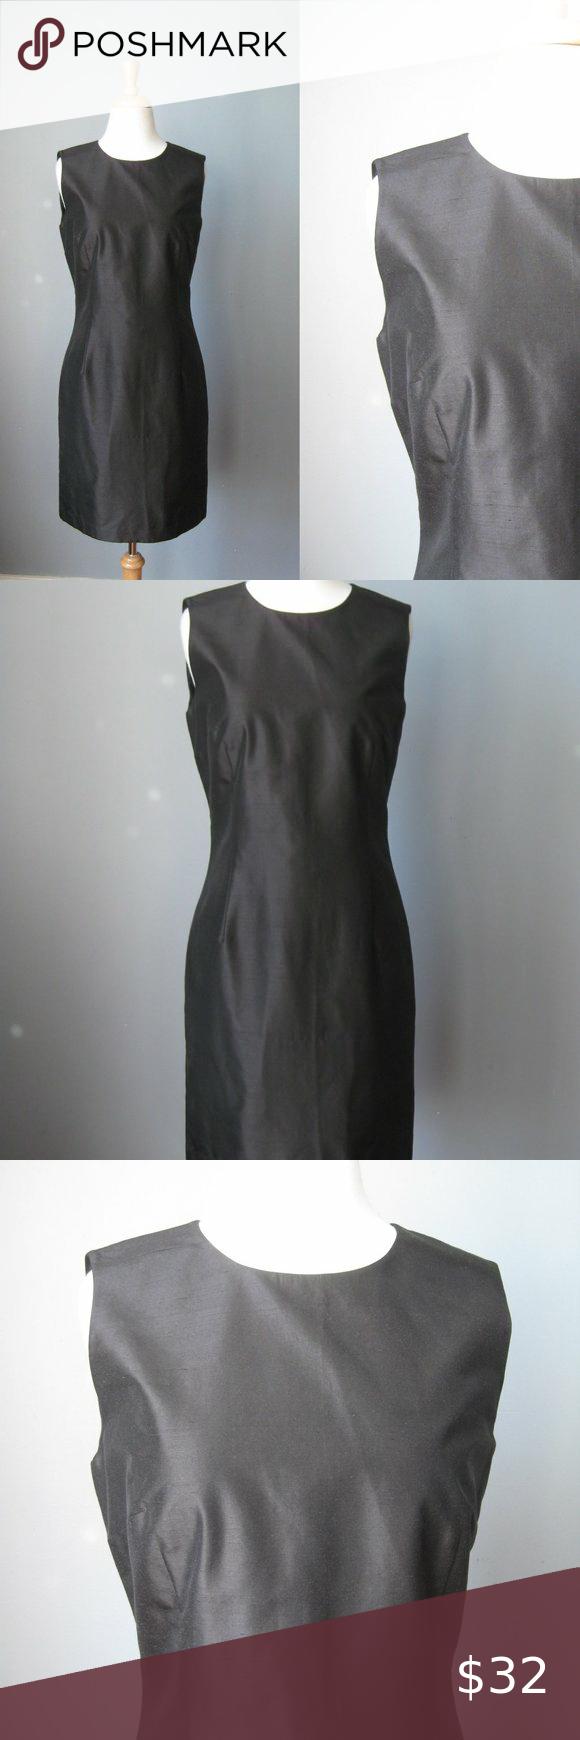 Vintage Talbot Sheath Dress Silk Lbd Sheath Dress Silk Sheath Dress Silk Dress [ 1740 x 580 Pixel ]